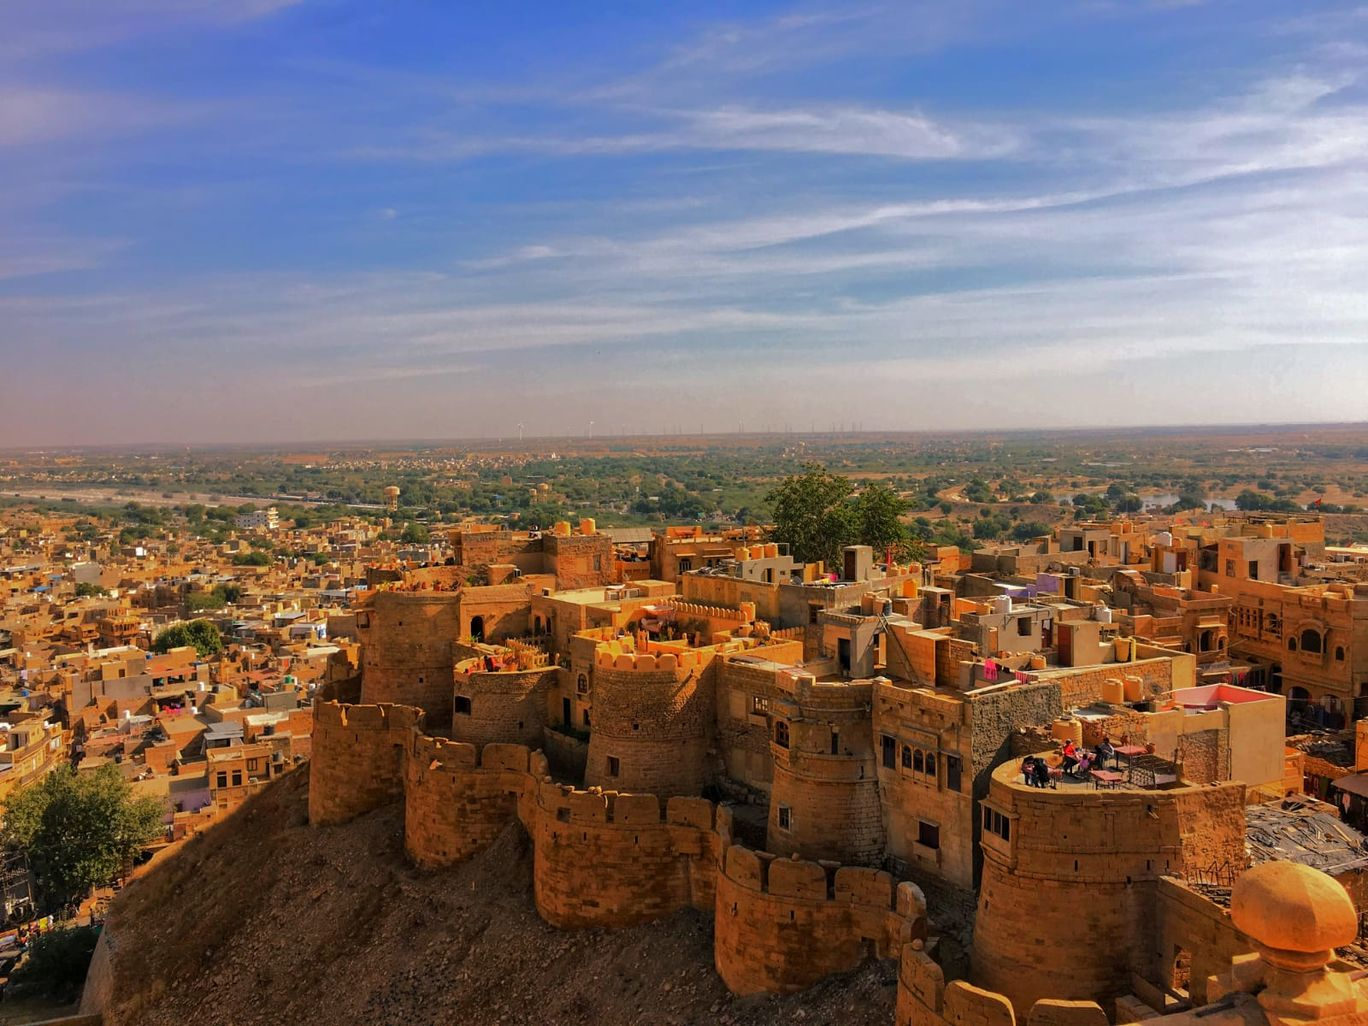 Photo of Jaisalmer By foovelnus